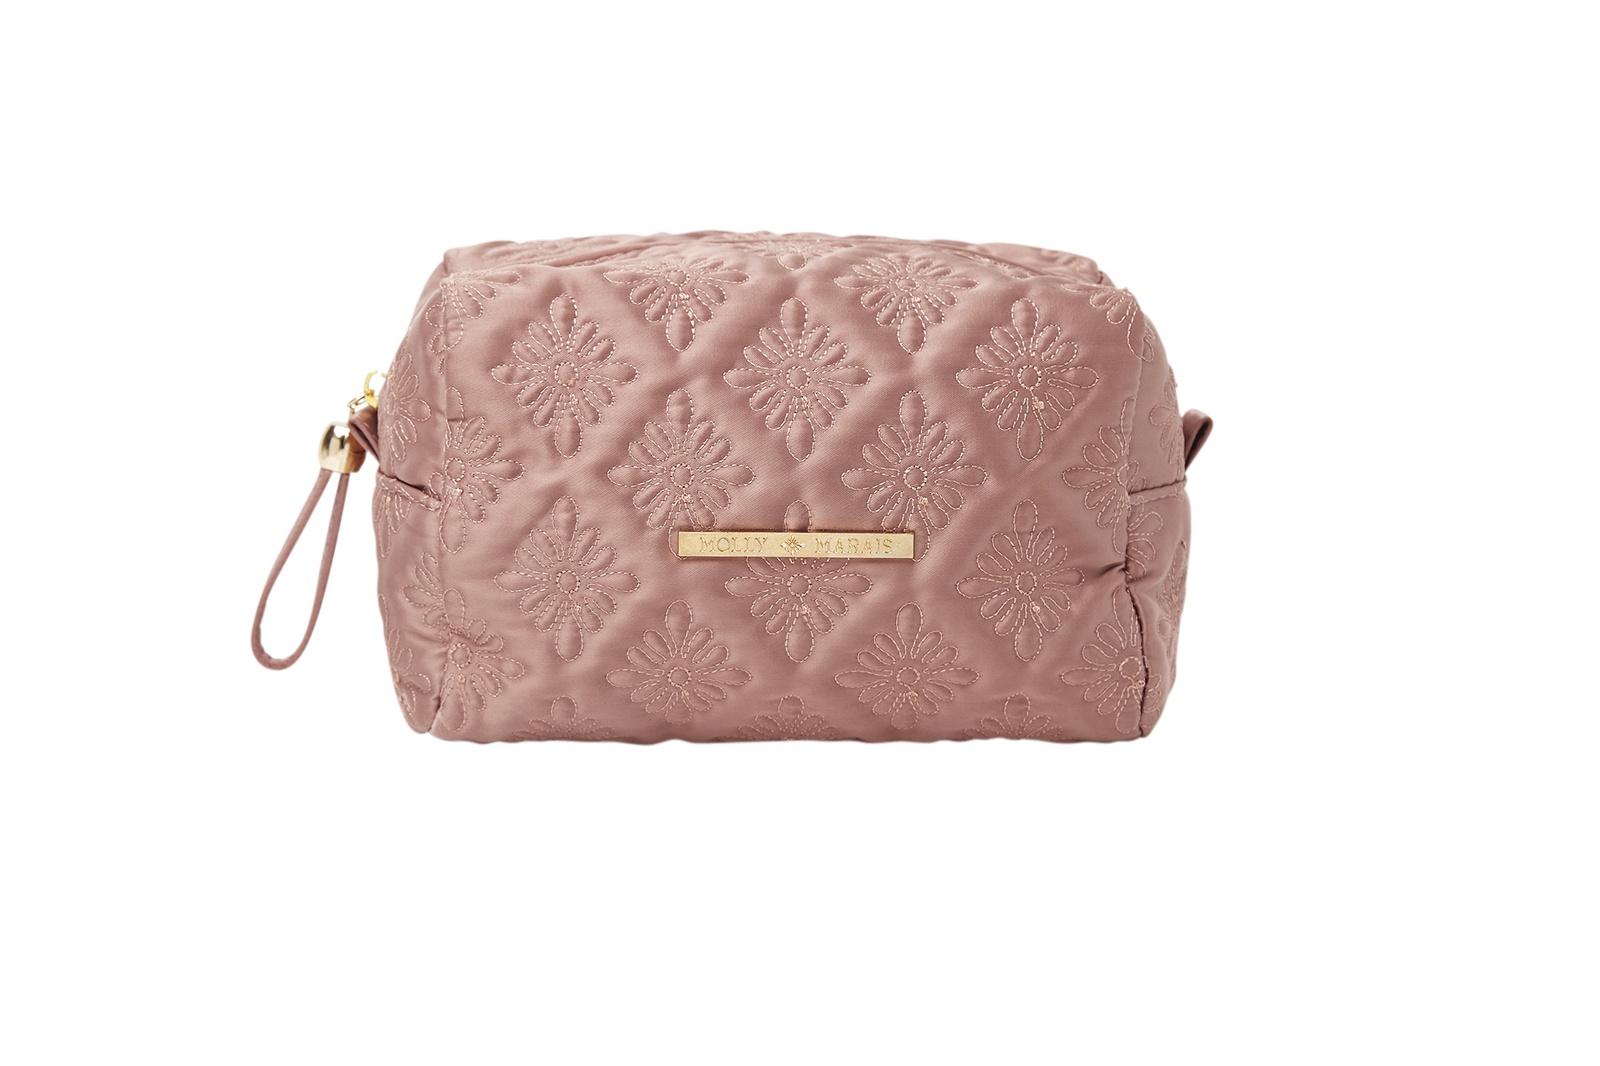 Косметичка Molly Marais кроссовки женские skechers d'lites bright blossoms цвет светло розовый 11977 ltpk размер 5 5 35